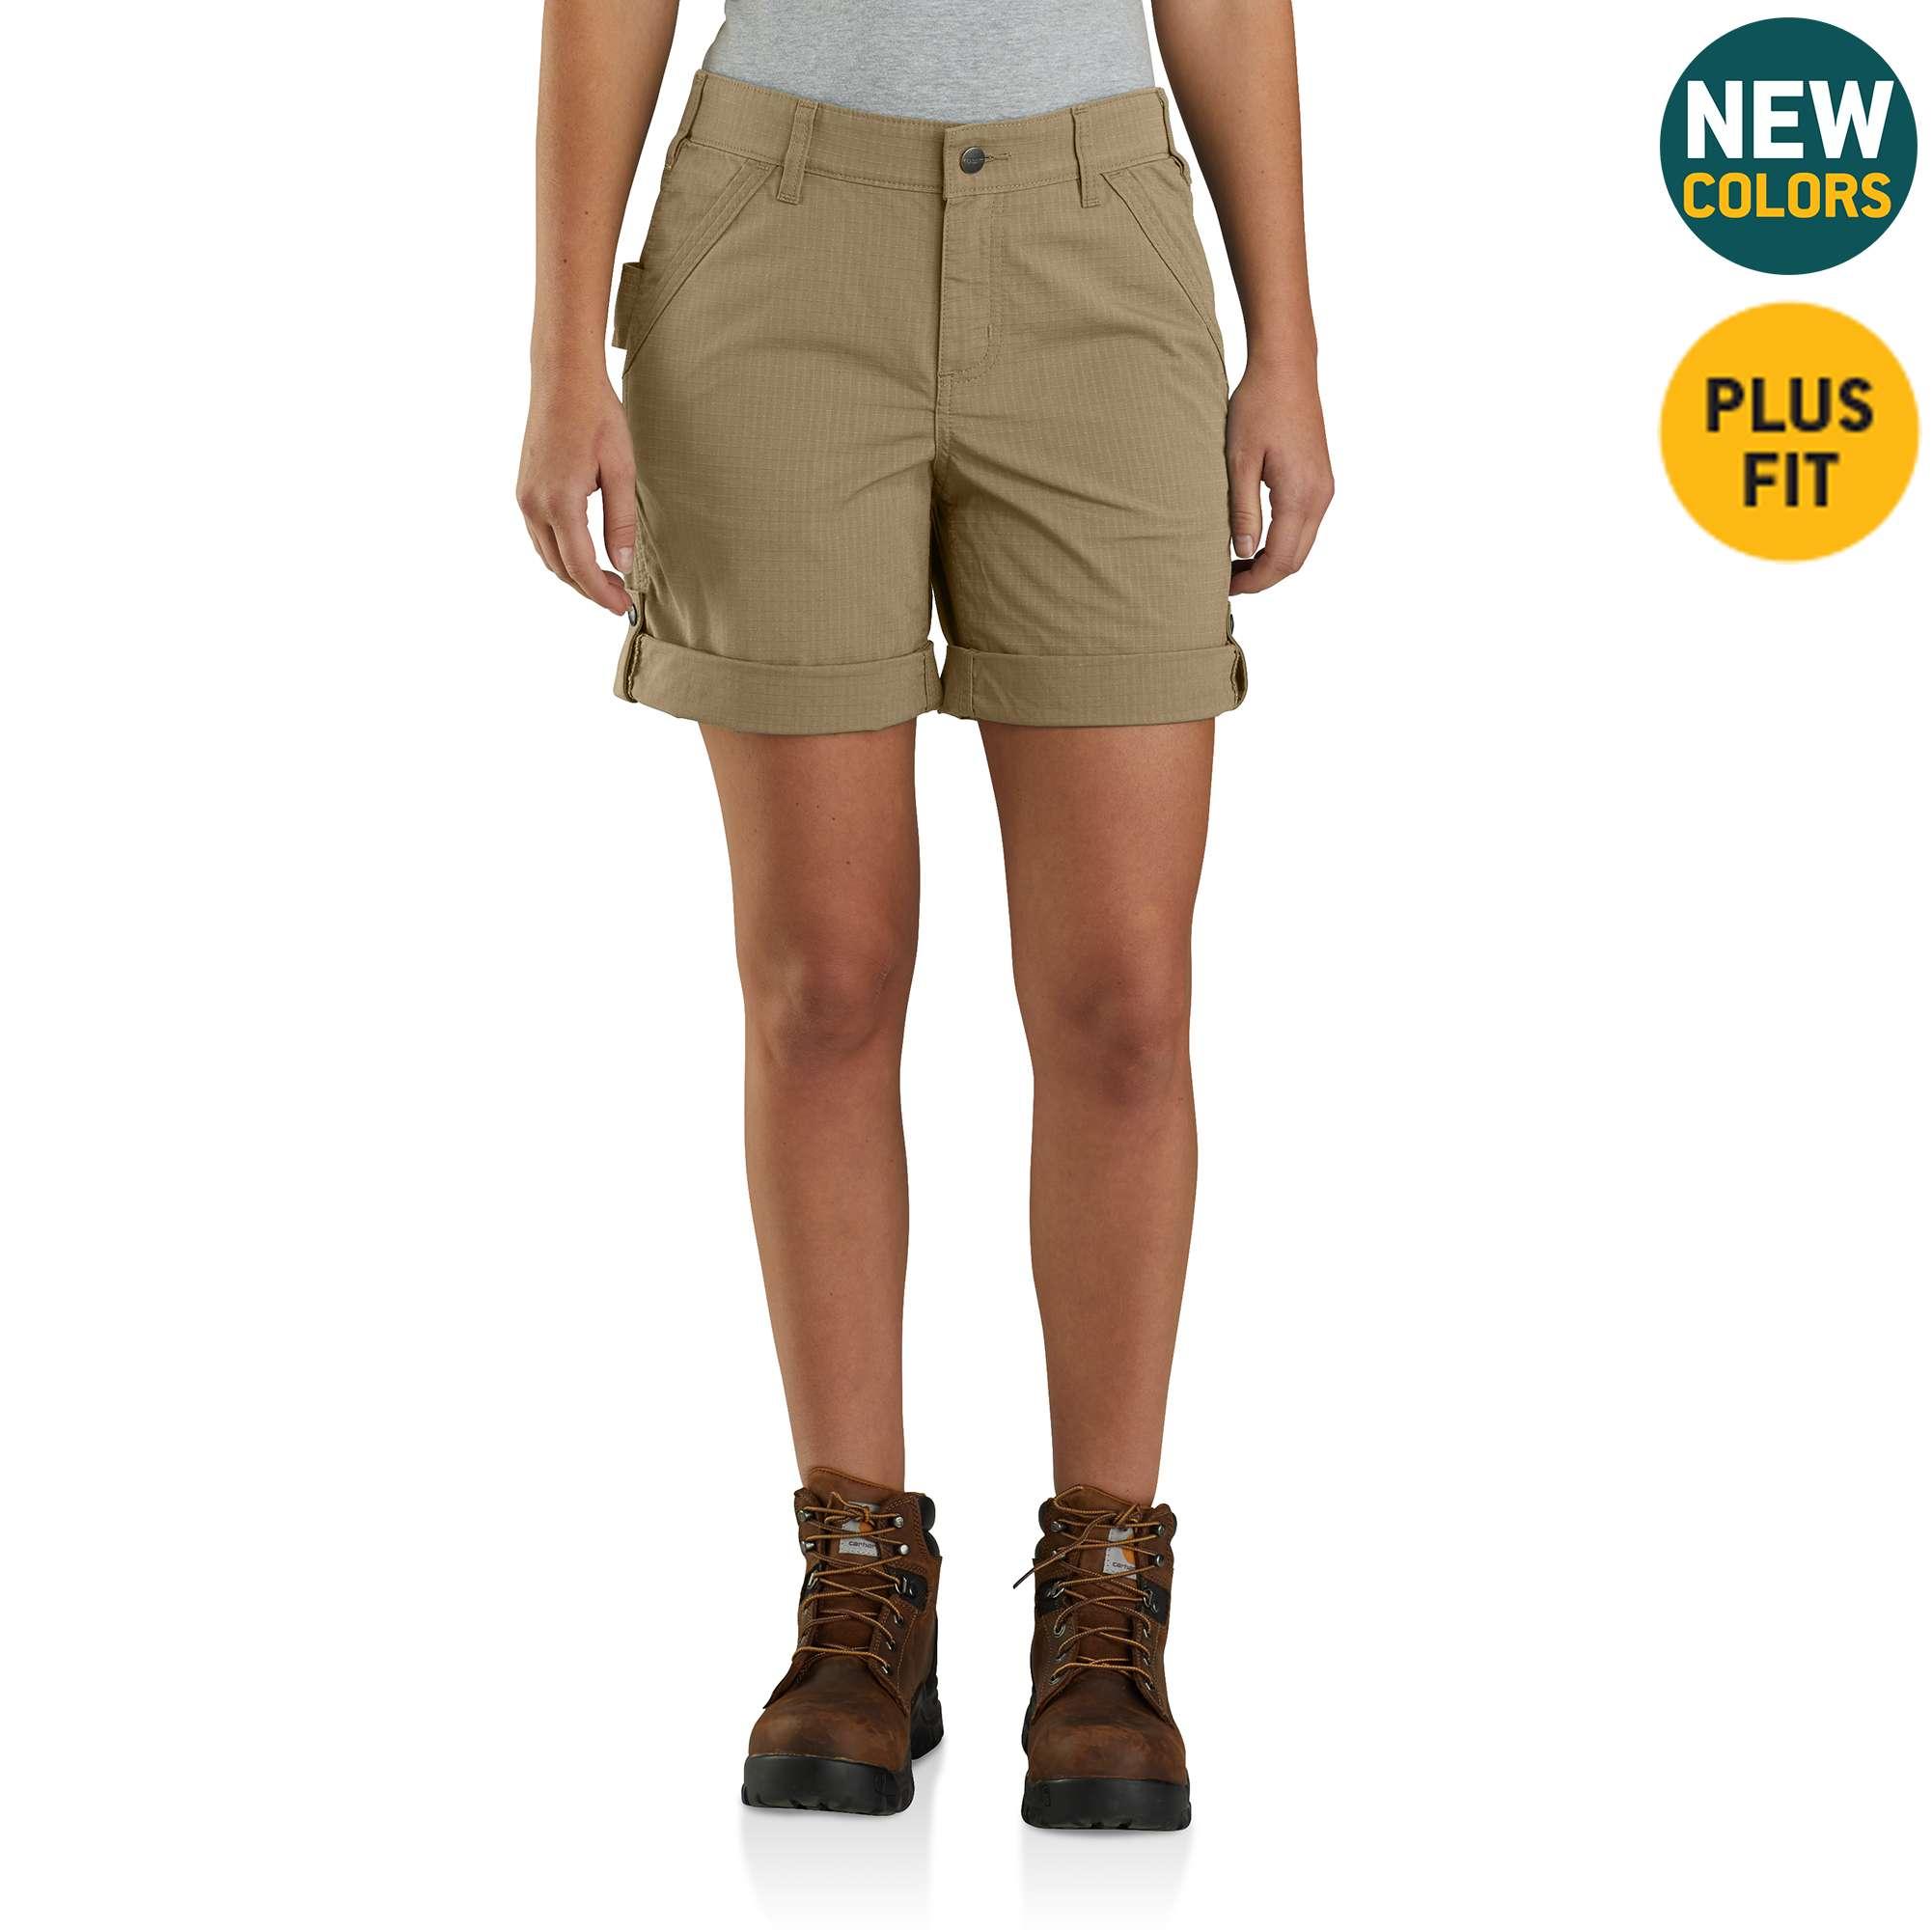 Rugged Flex Original Fit Ripstop Five-Pocket Shorts